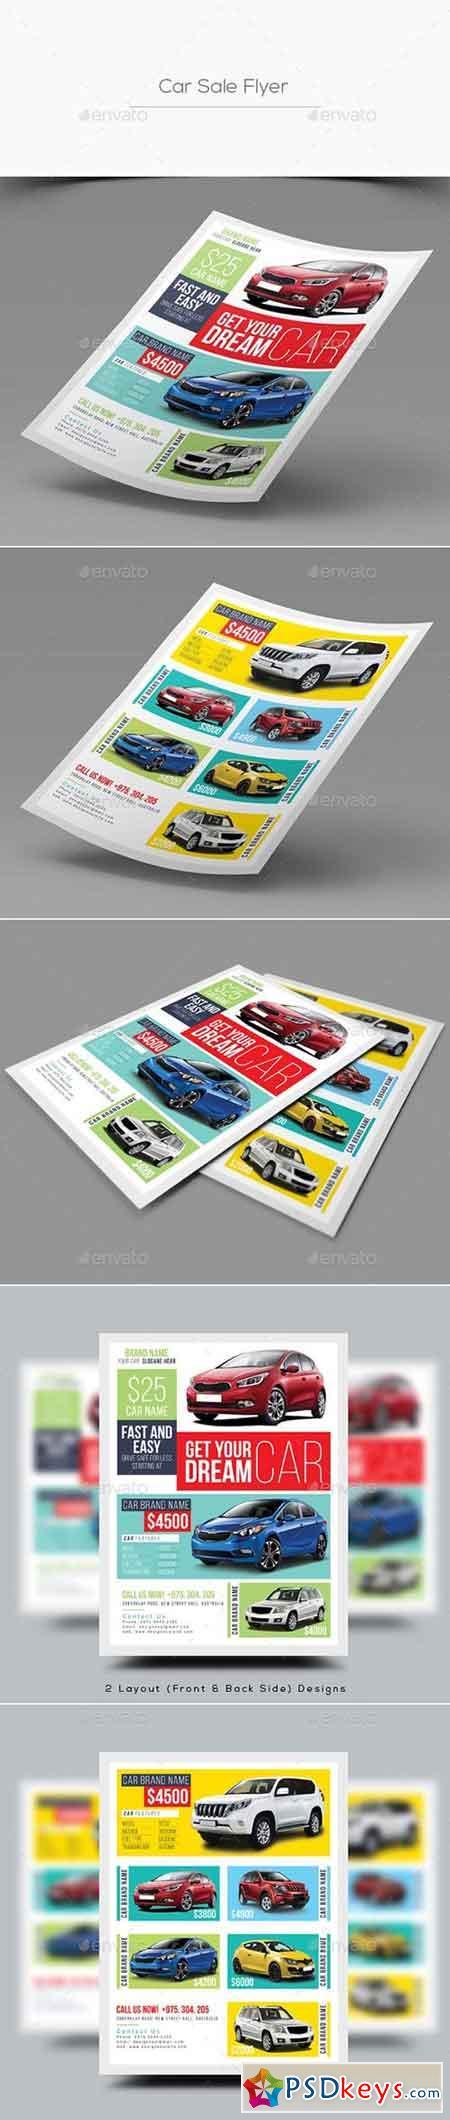 car Free Download Photoshop Vector image Via Torrent – Car Sale Flyer